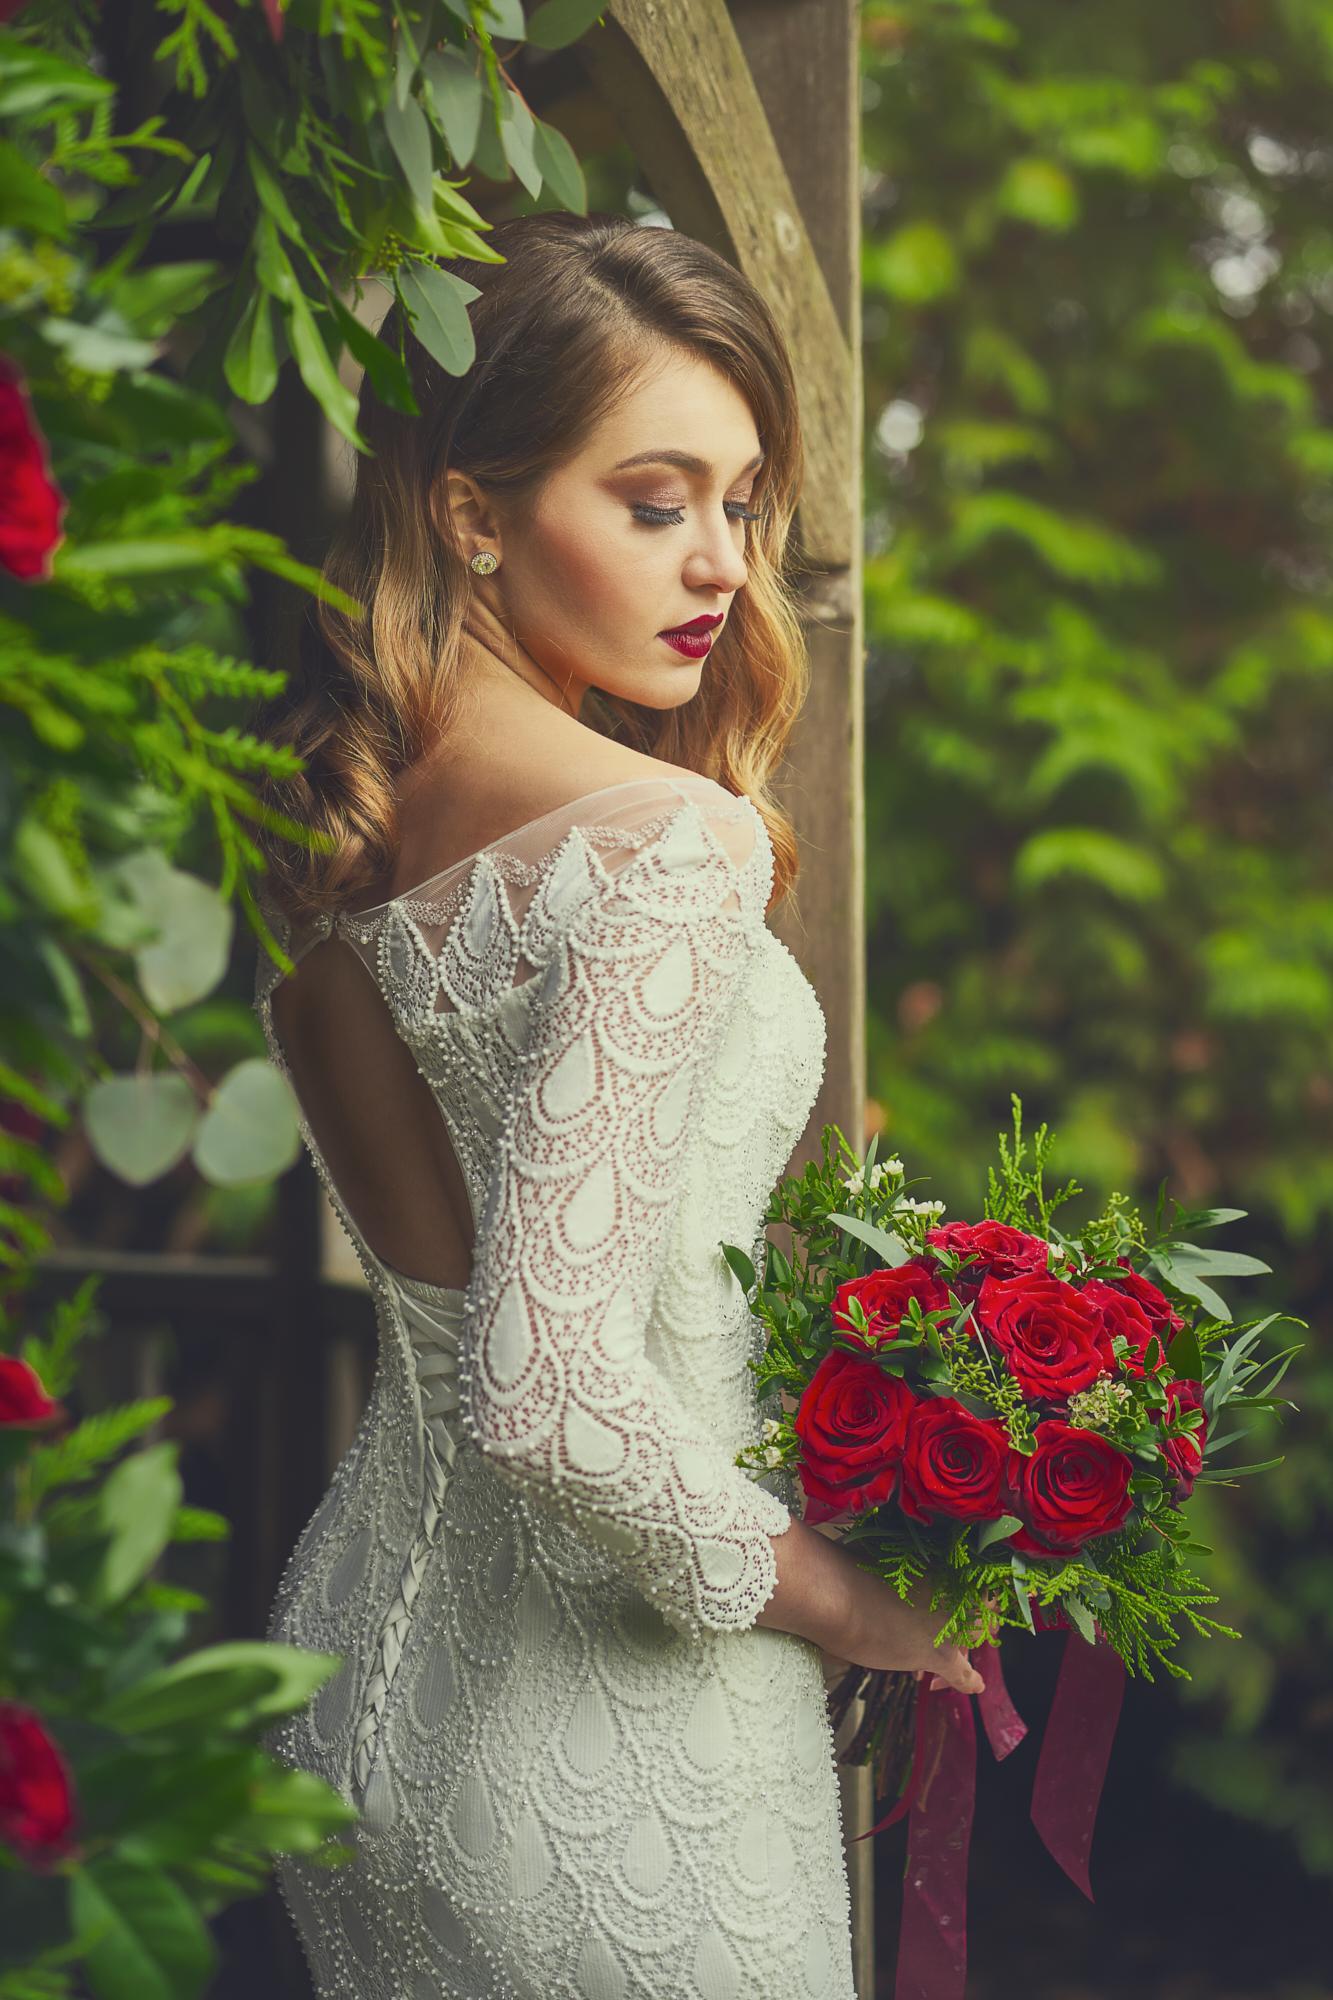 Nov 25 - Bridal Farm Style Shoot - FinalEdit - Web 0008.jpg